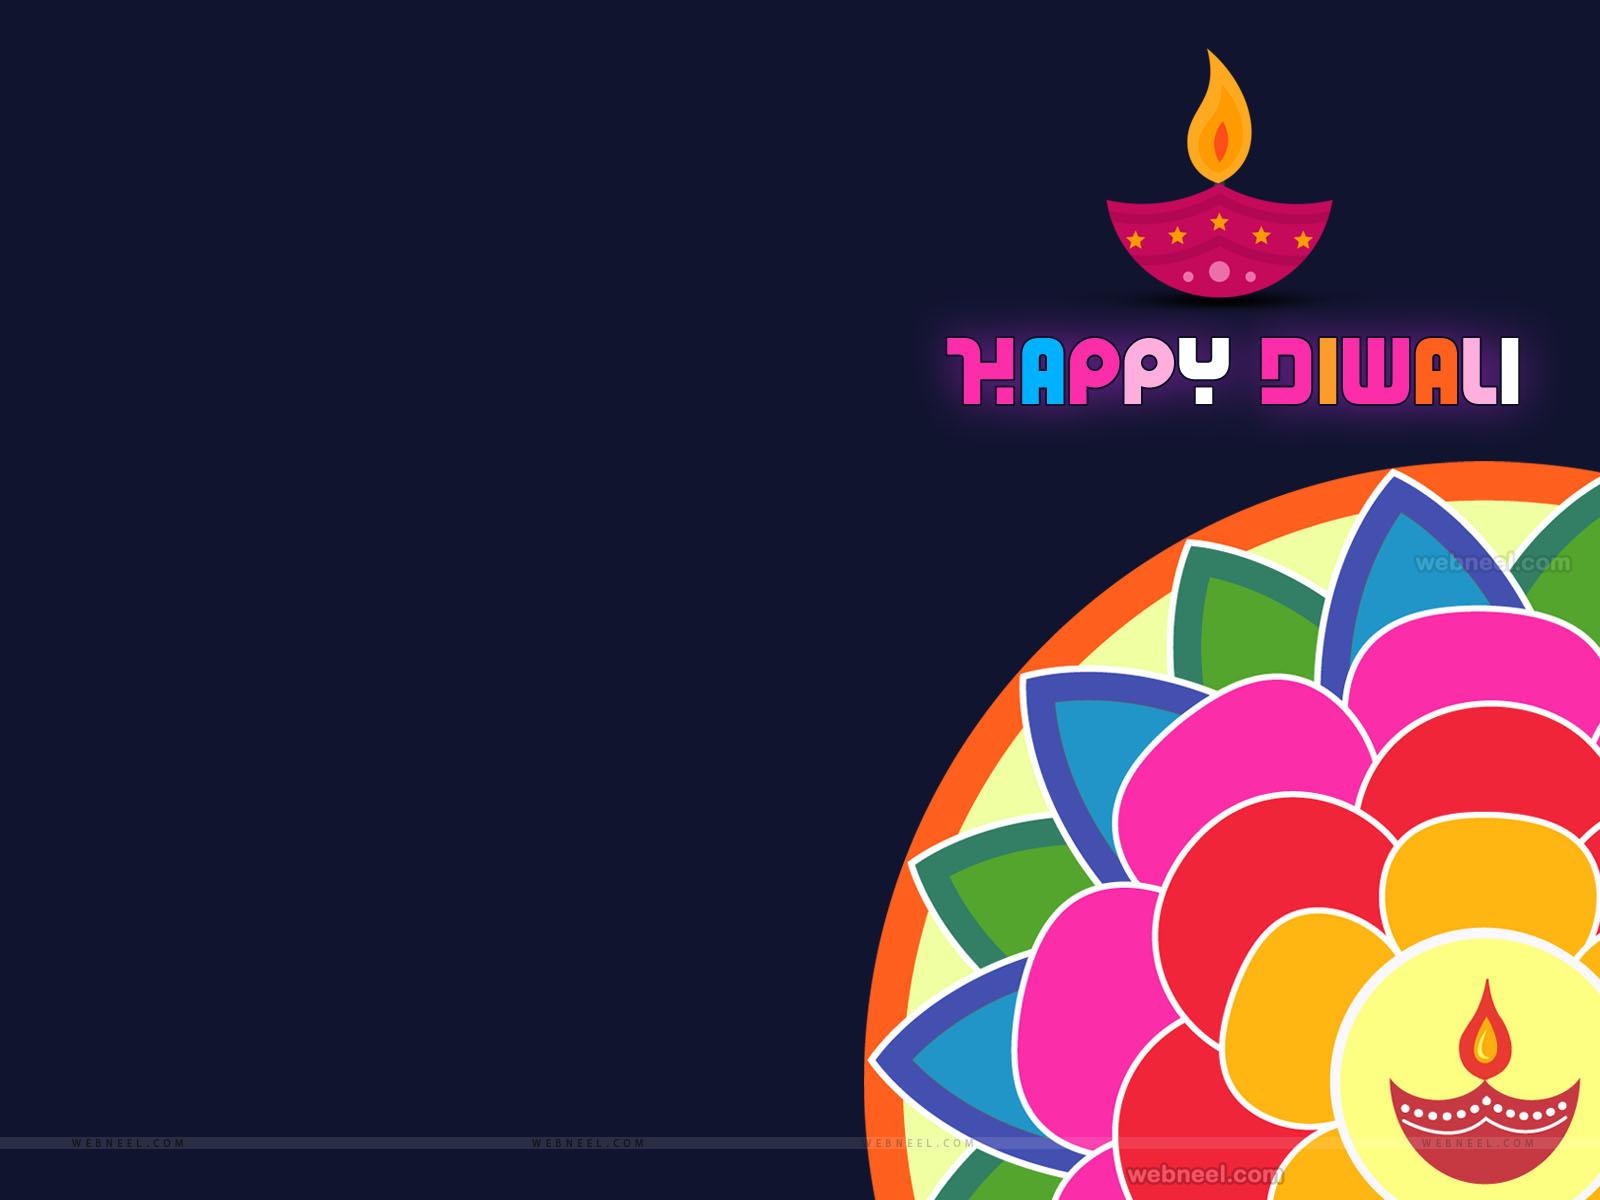 Diwali Hd Wallpaper Download Download Diwali Hd Wallpapers 2016 Infotainment Jobs